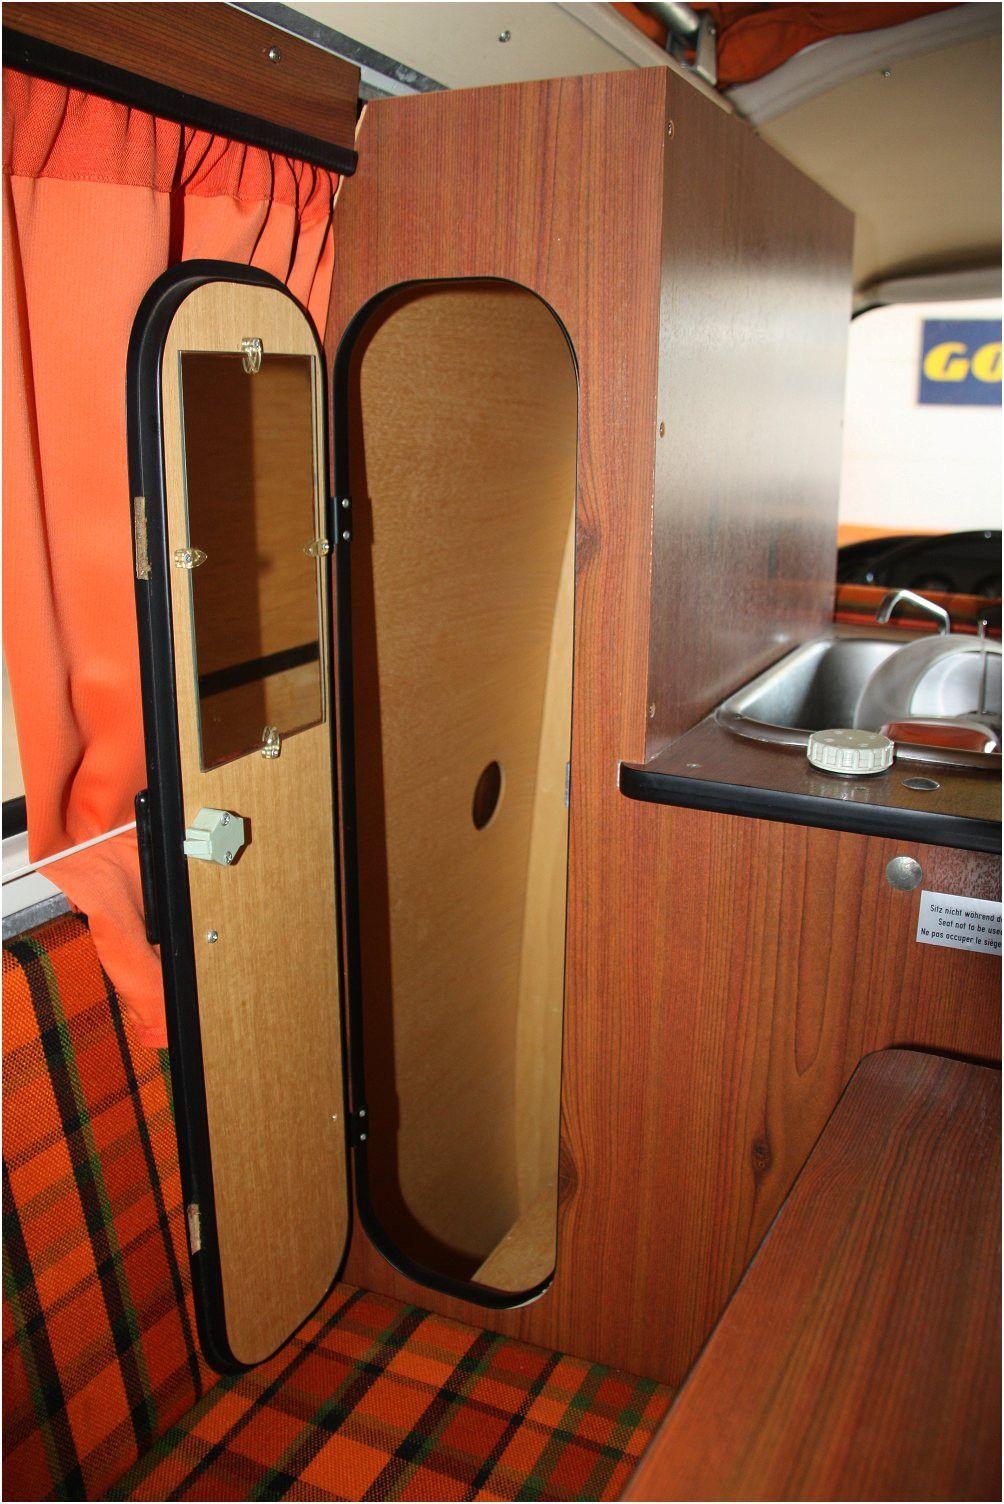 bus vw volkswagen baywindow westfalia camper a vendre for sale pat vw shop seventies 70s 1975. Black Bedroom Furniture Sets. Home Design Ideas